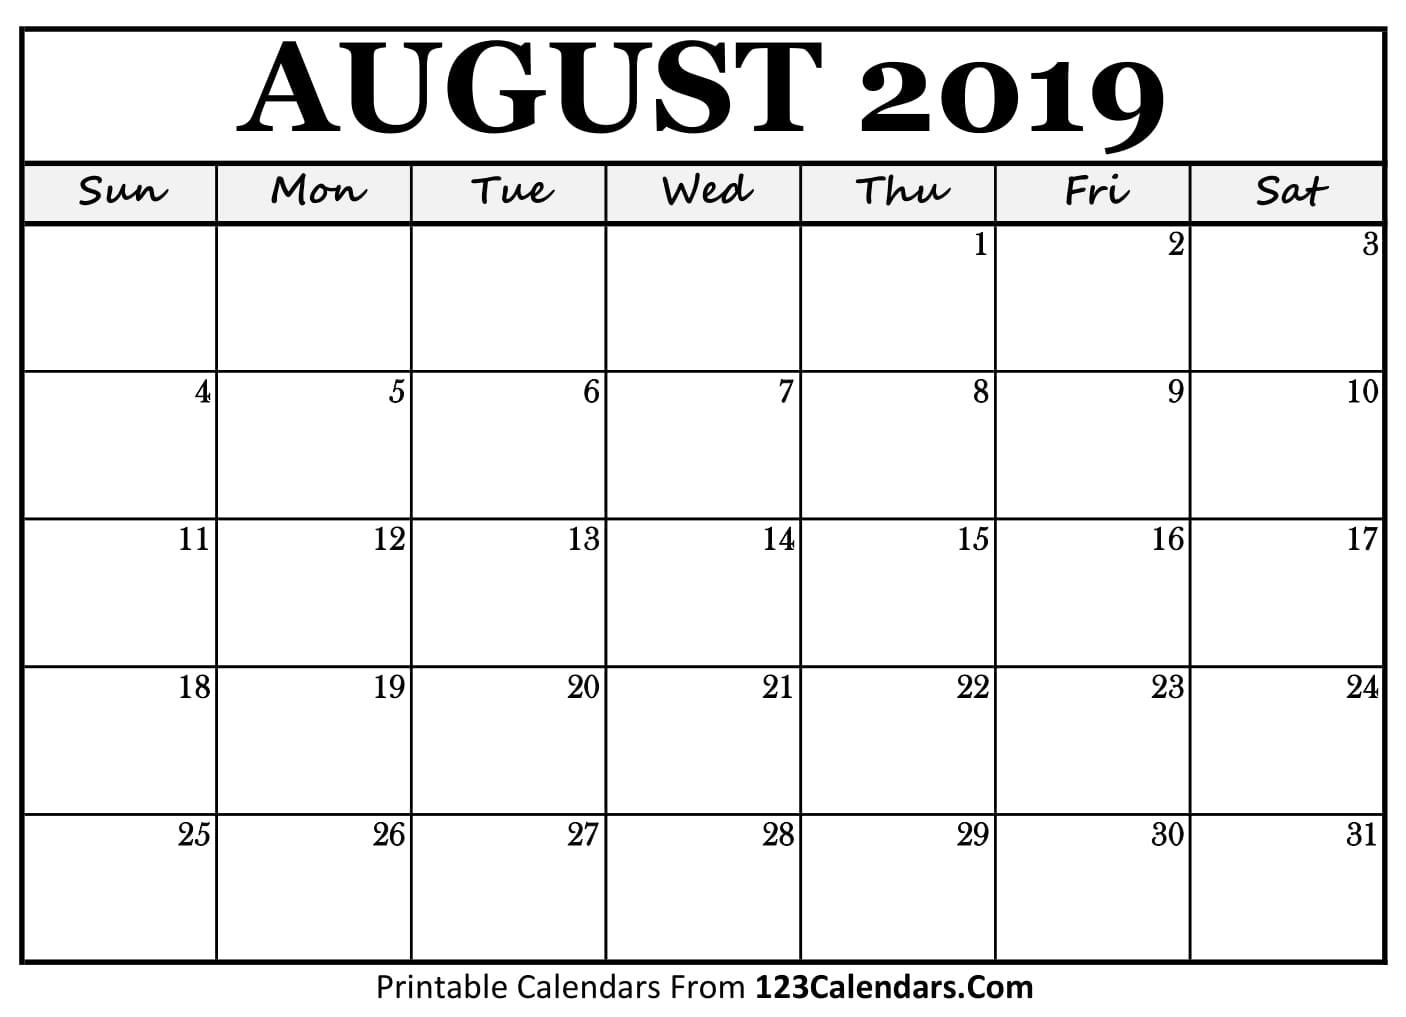 August 2019 Printable Calendar   123Calendars